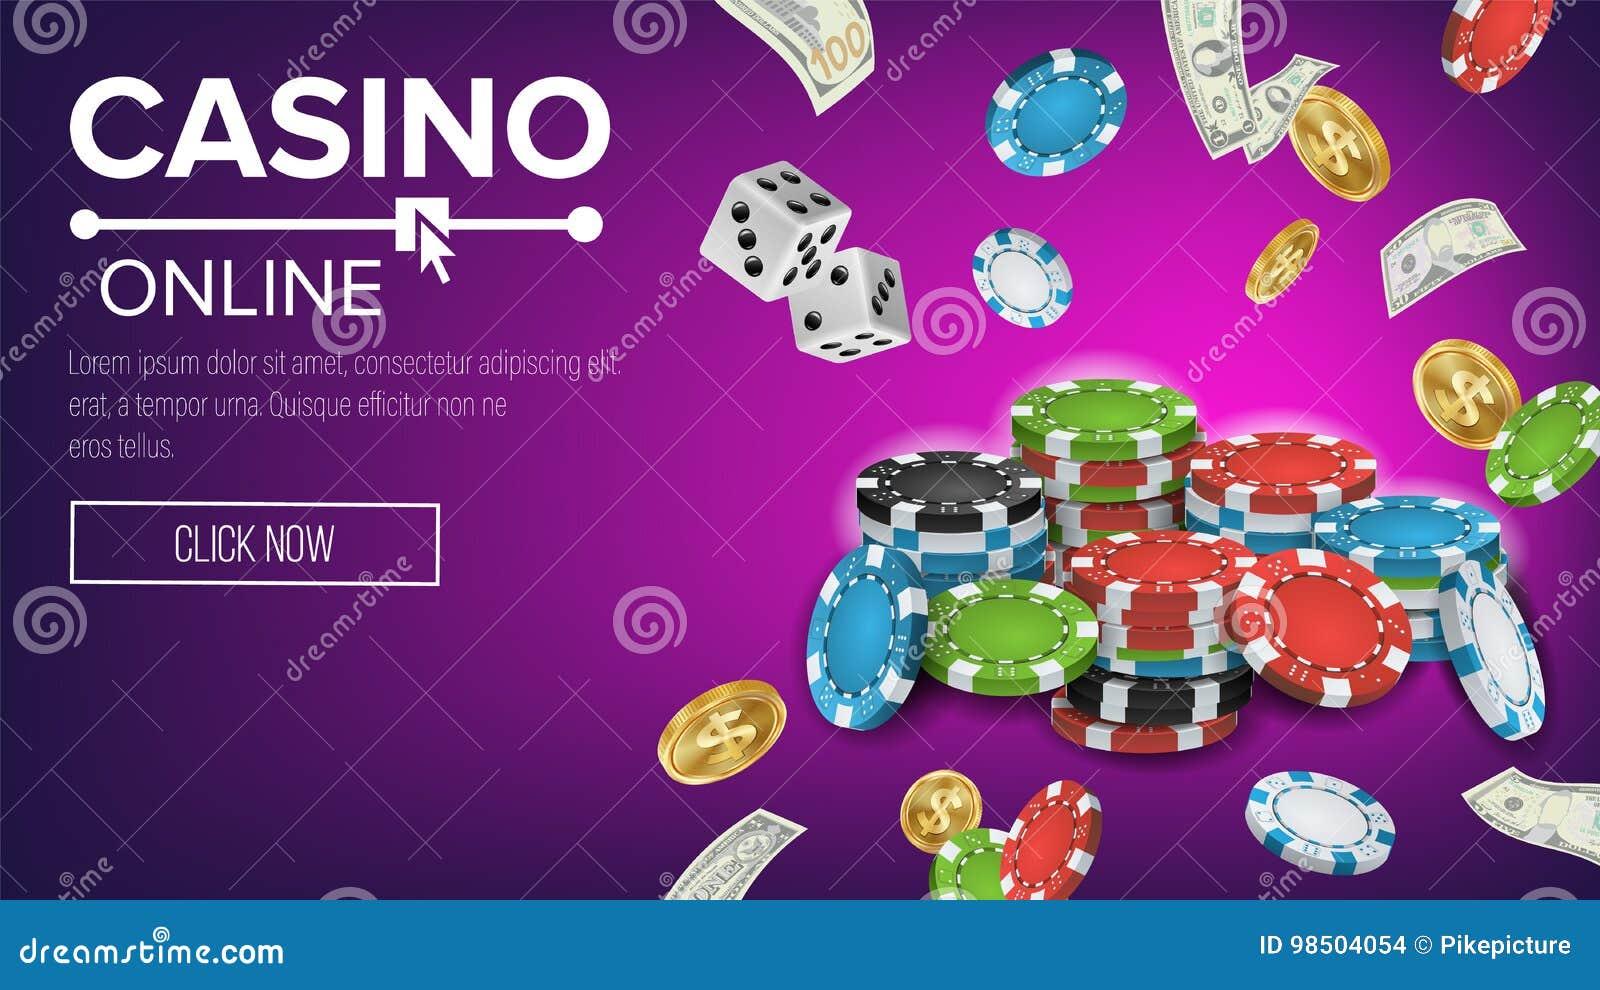 Casinos xplosive português 31547